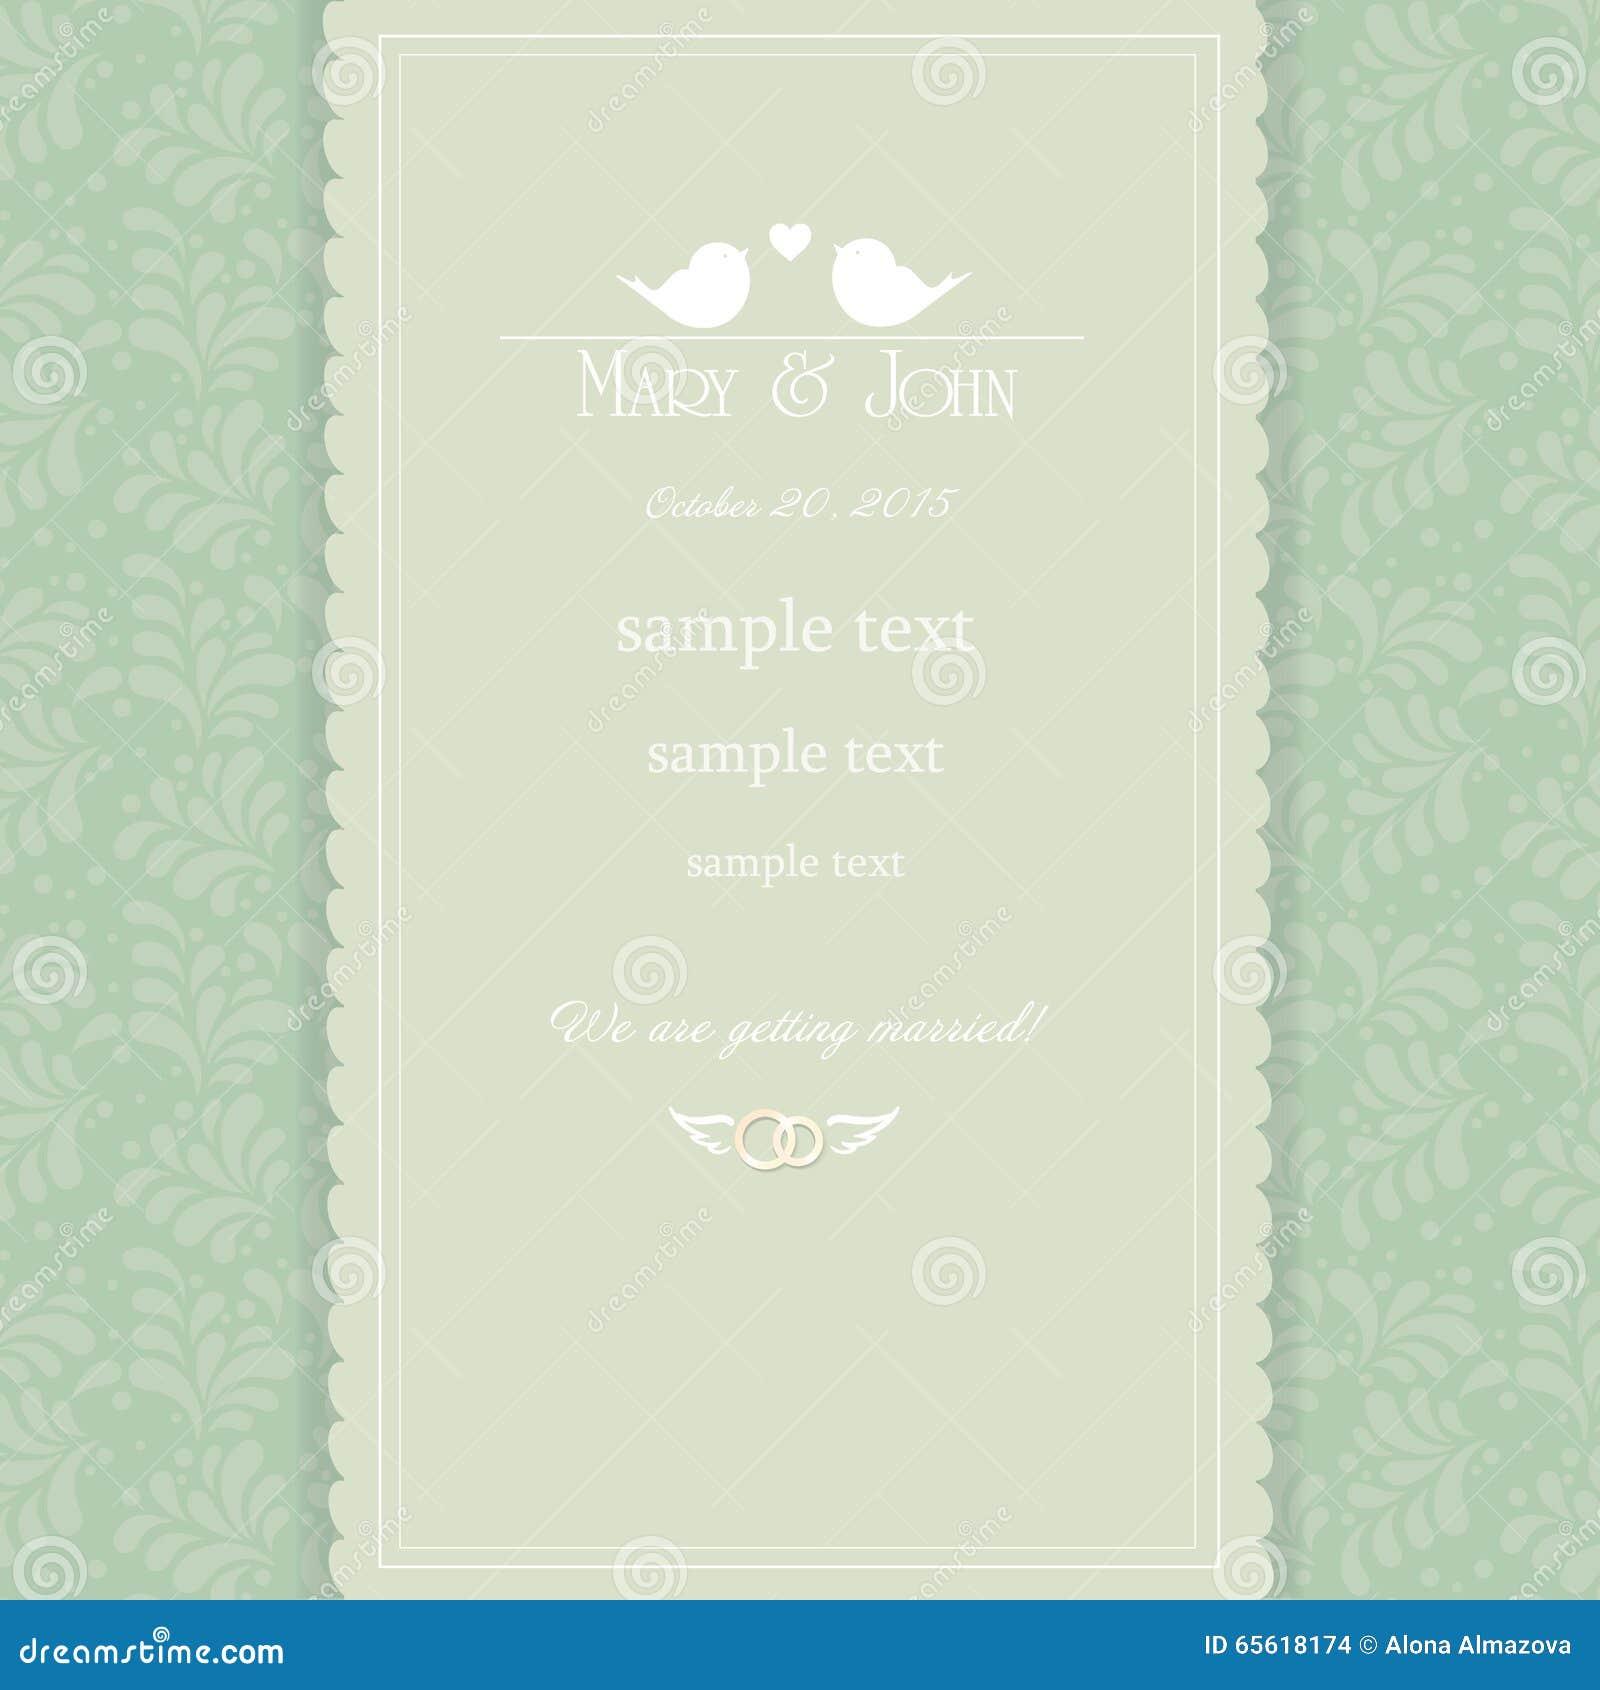 Vintage wedding invitation card stock vector illustration of download vintage wedding invitation card stock vector illustration of english detailed 65618174 stopboris Image collections